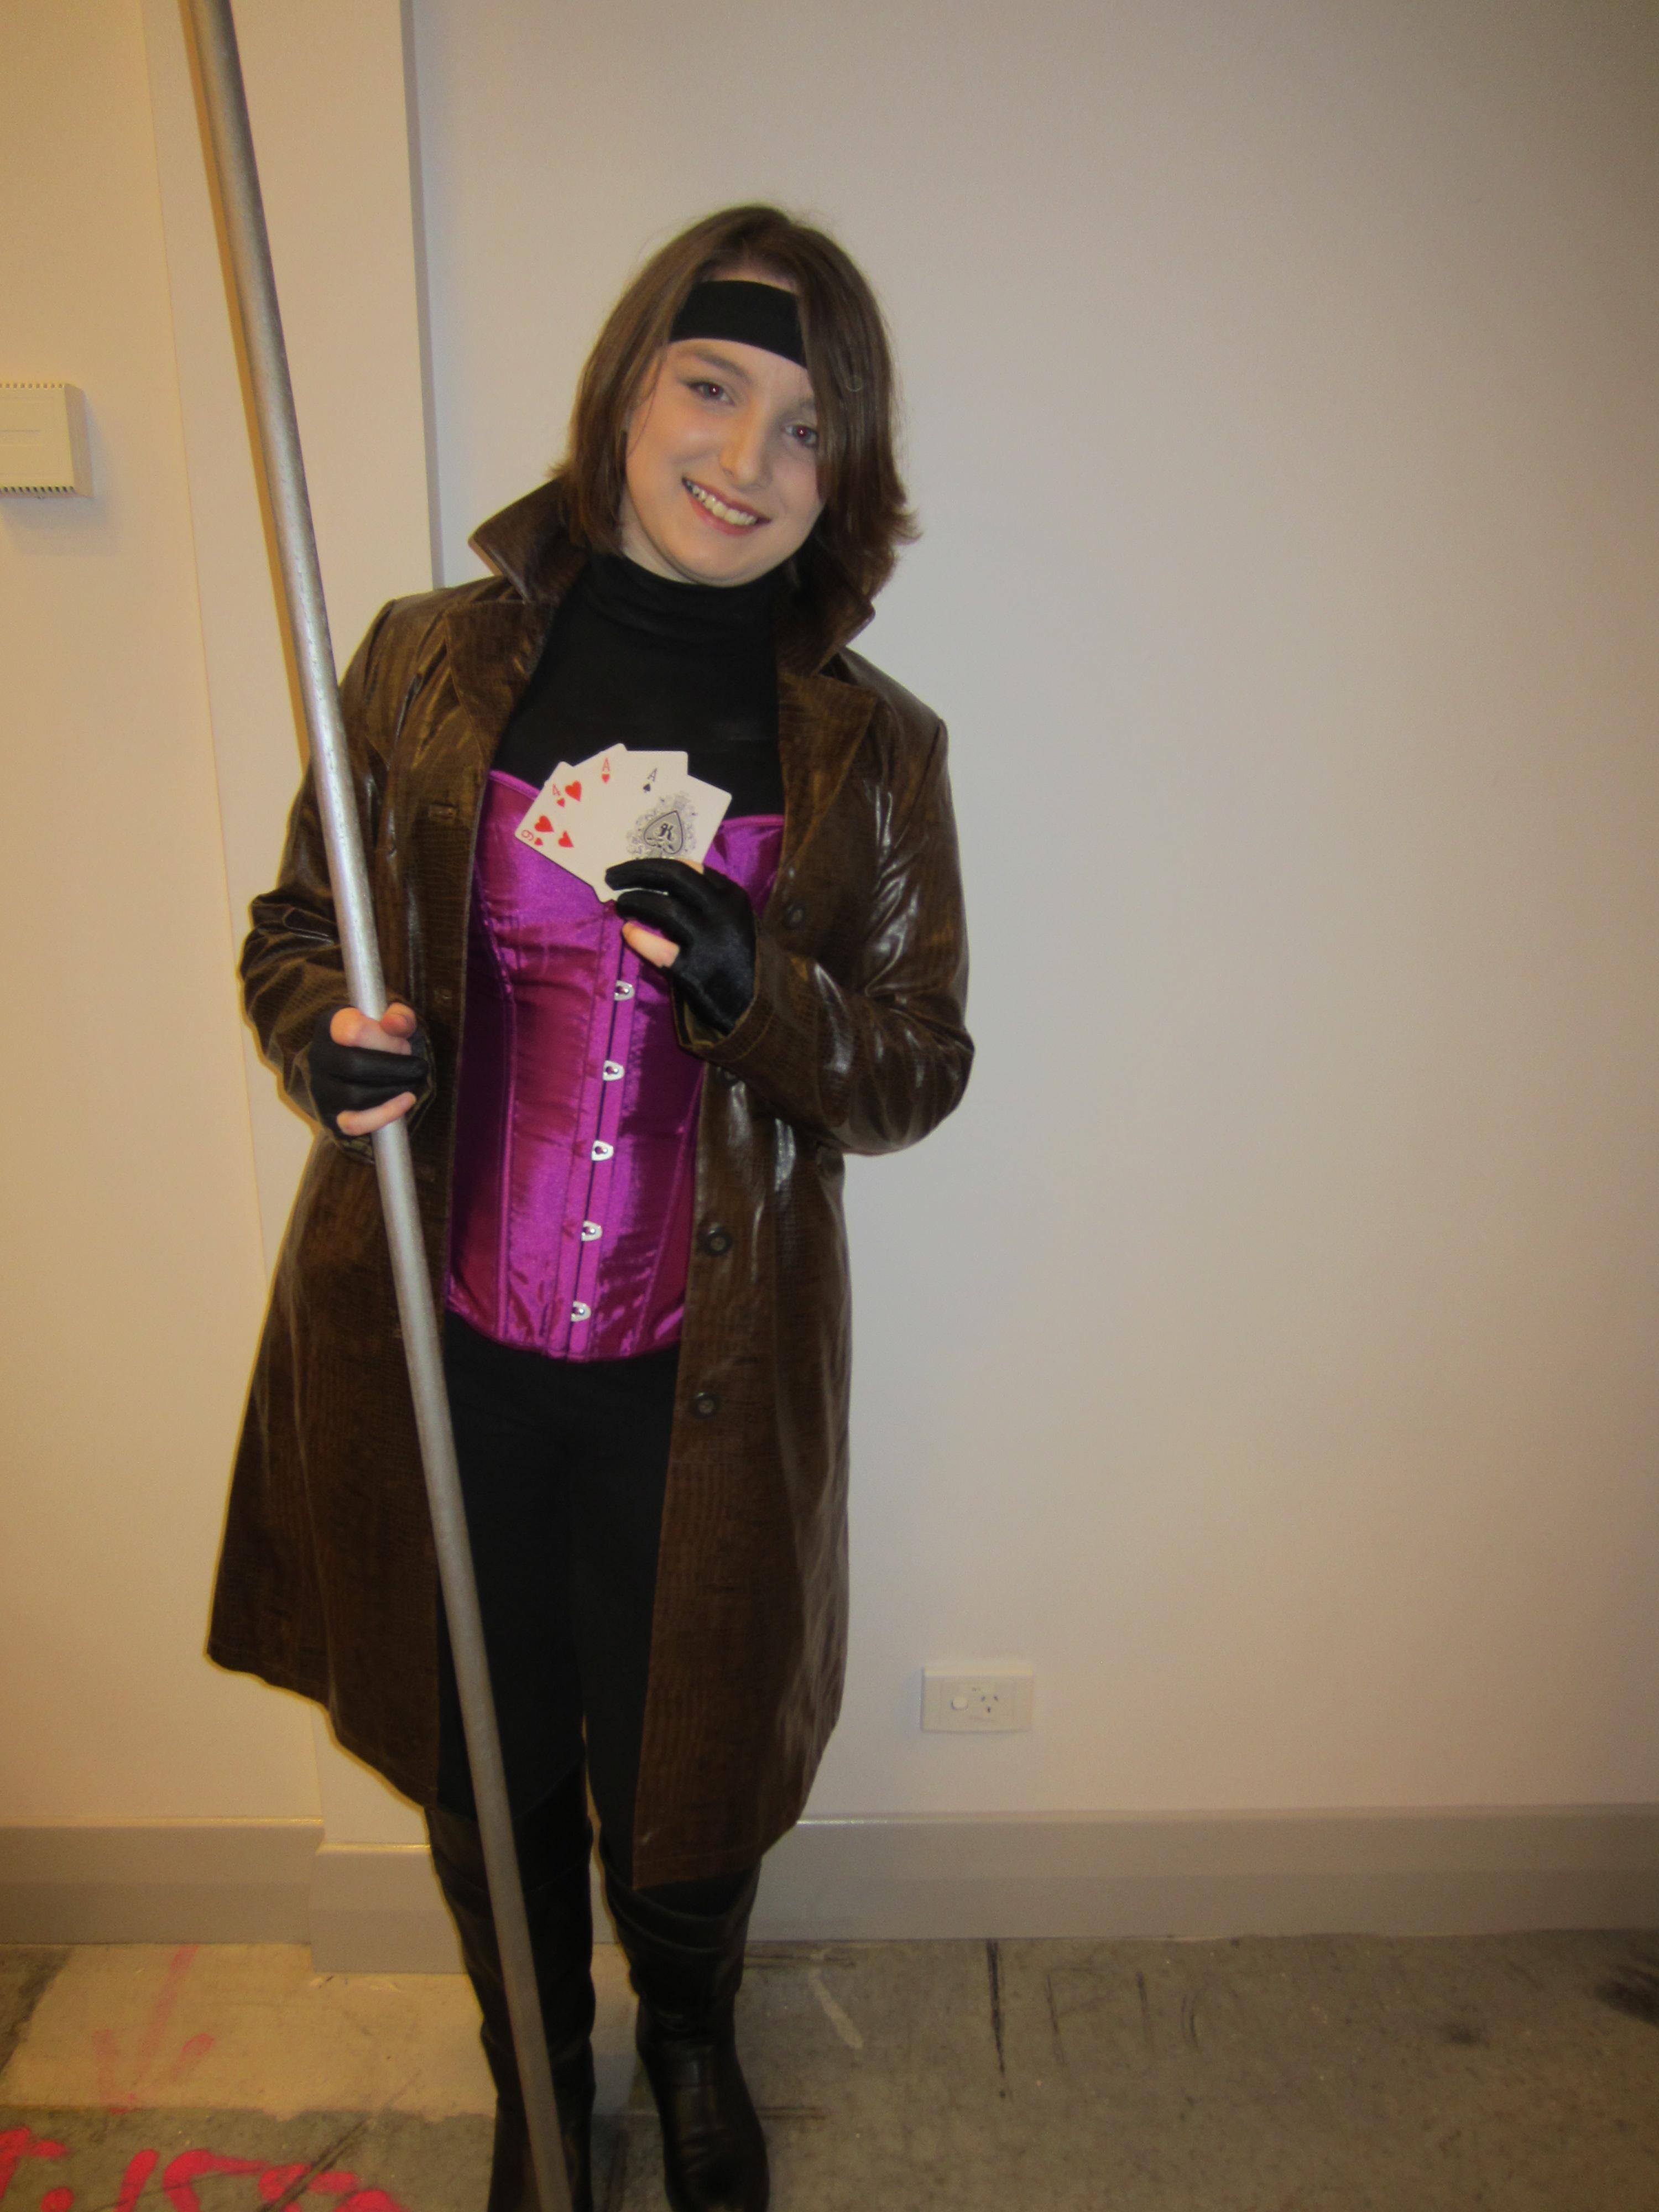 ... Susan Storm Invisible ...  sc 1 st  rantings of the ninja robot - WordPress.com & cosplay | rantings of the ninja robot